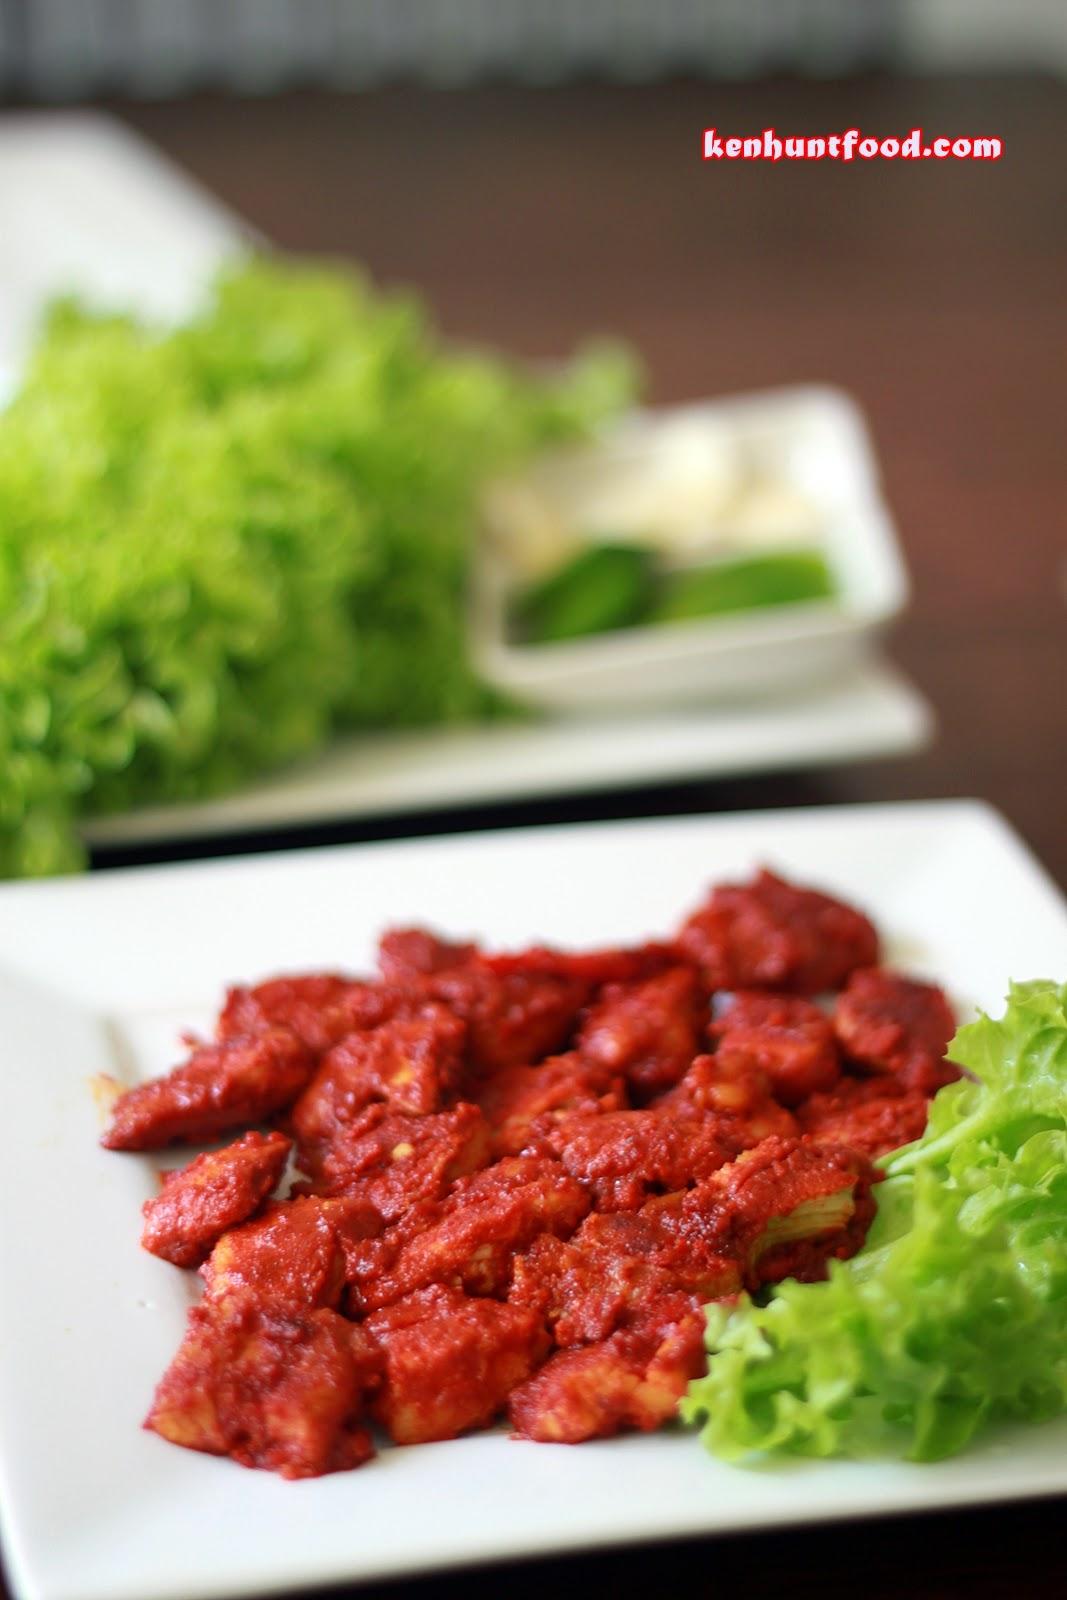 Ken Hunts Food K Pot Korean Bbq Garden Restaurant Tanjung Bungah Penang